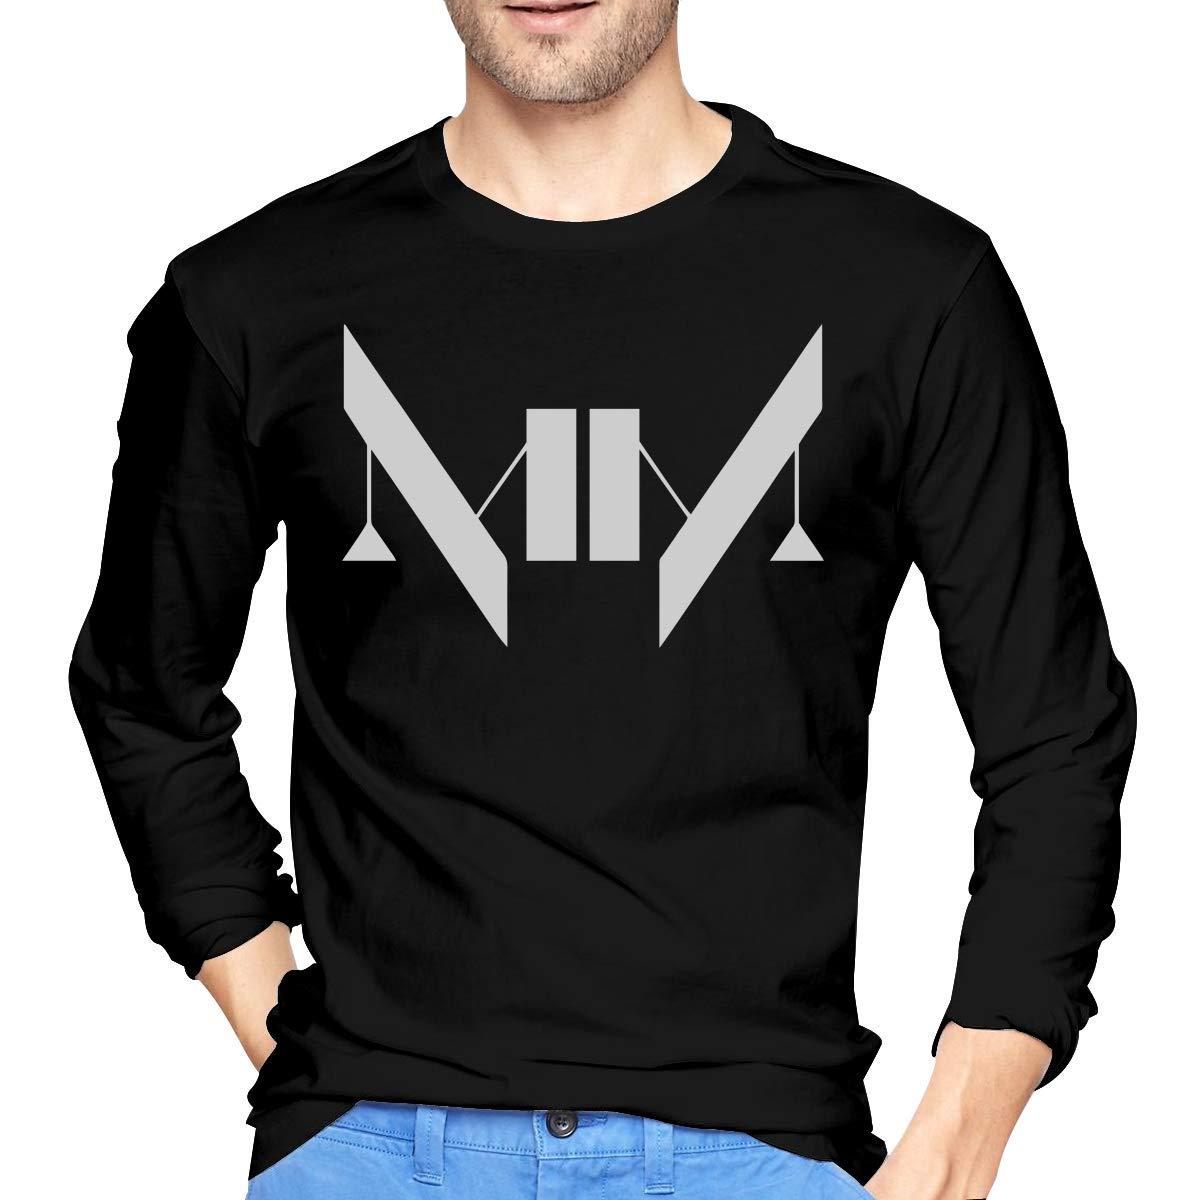 Fssatung S Marilyn Manson Tees Black Shirts